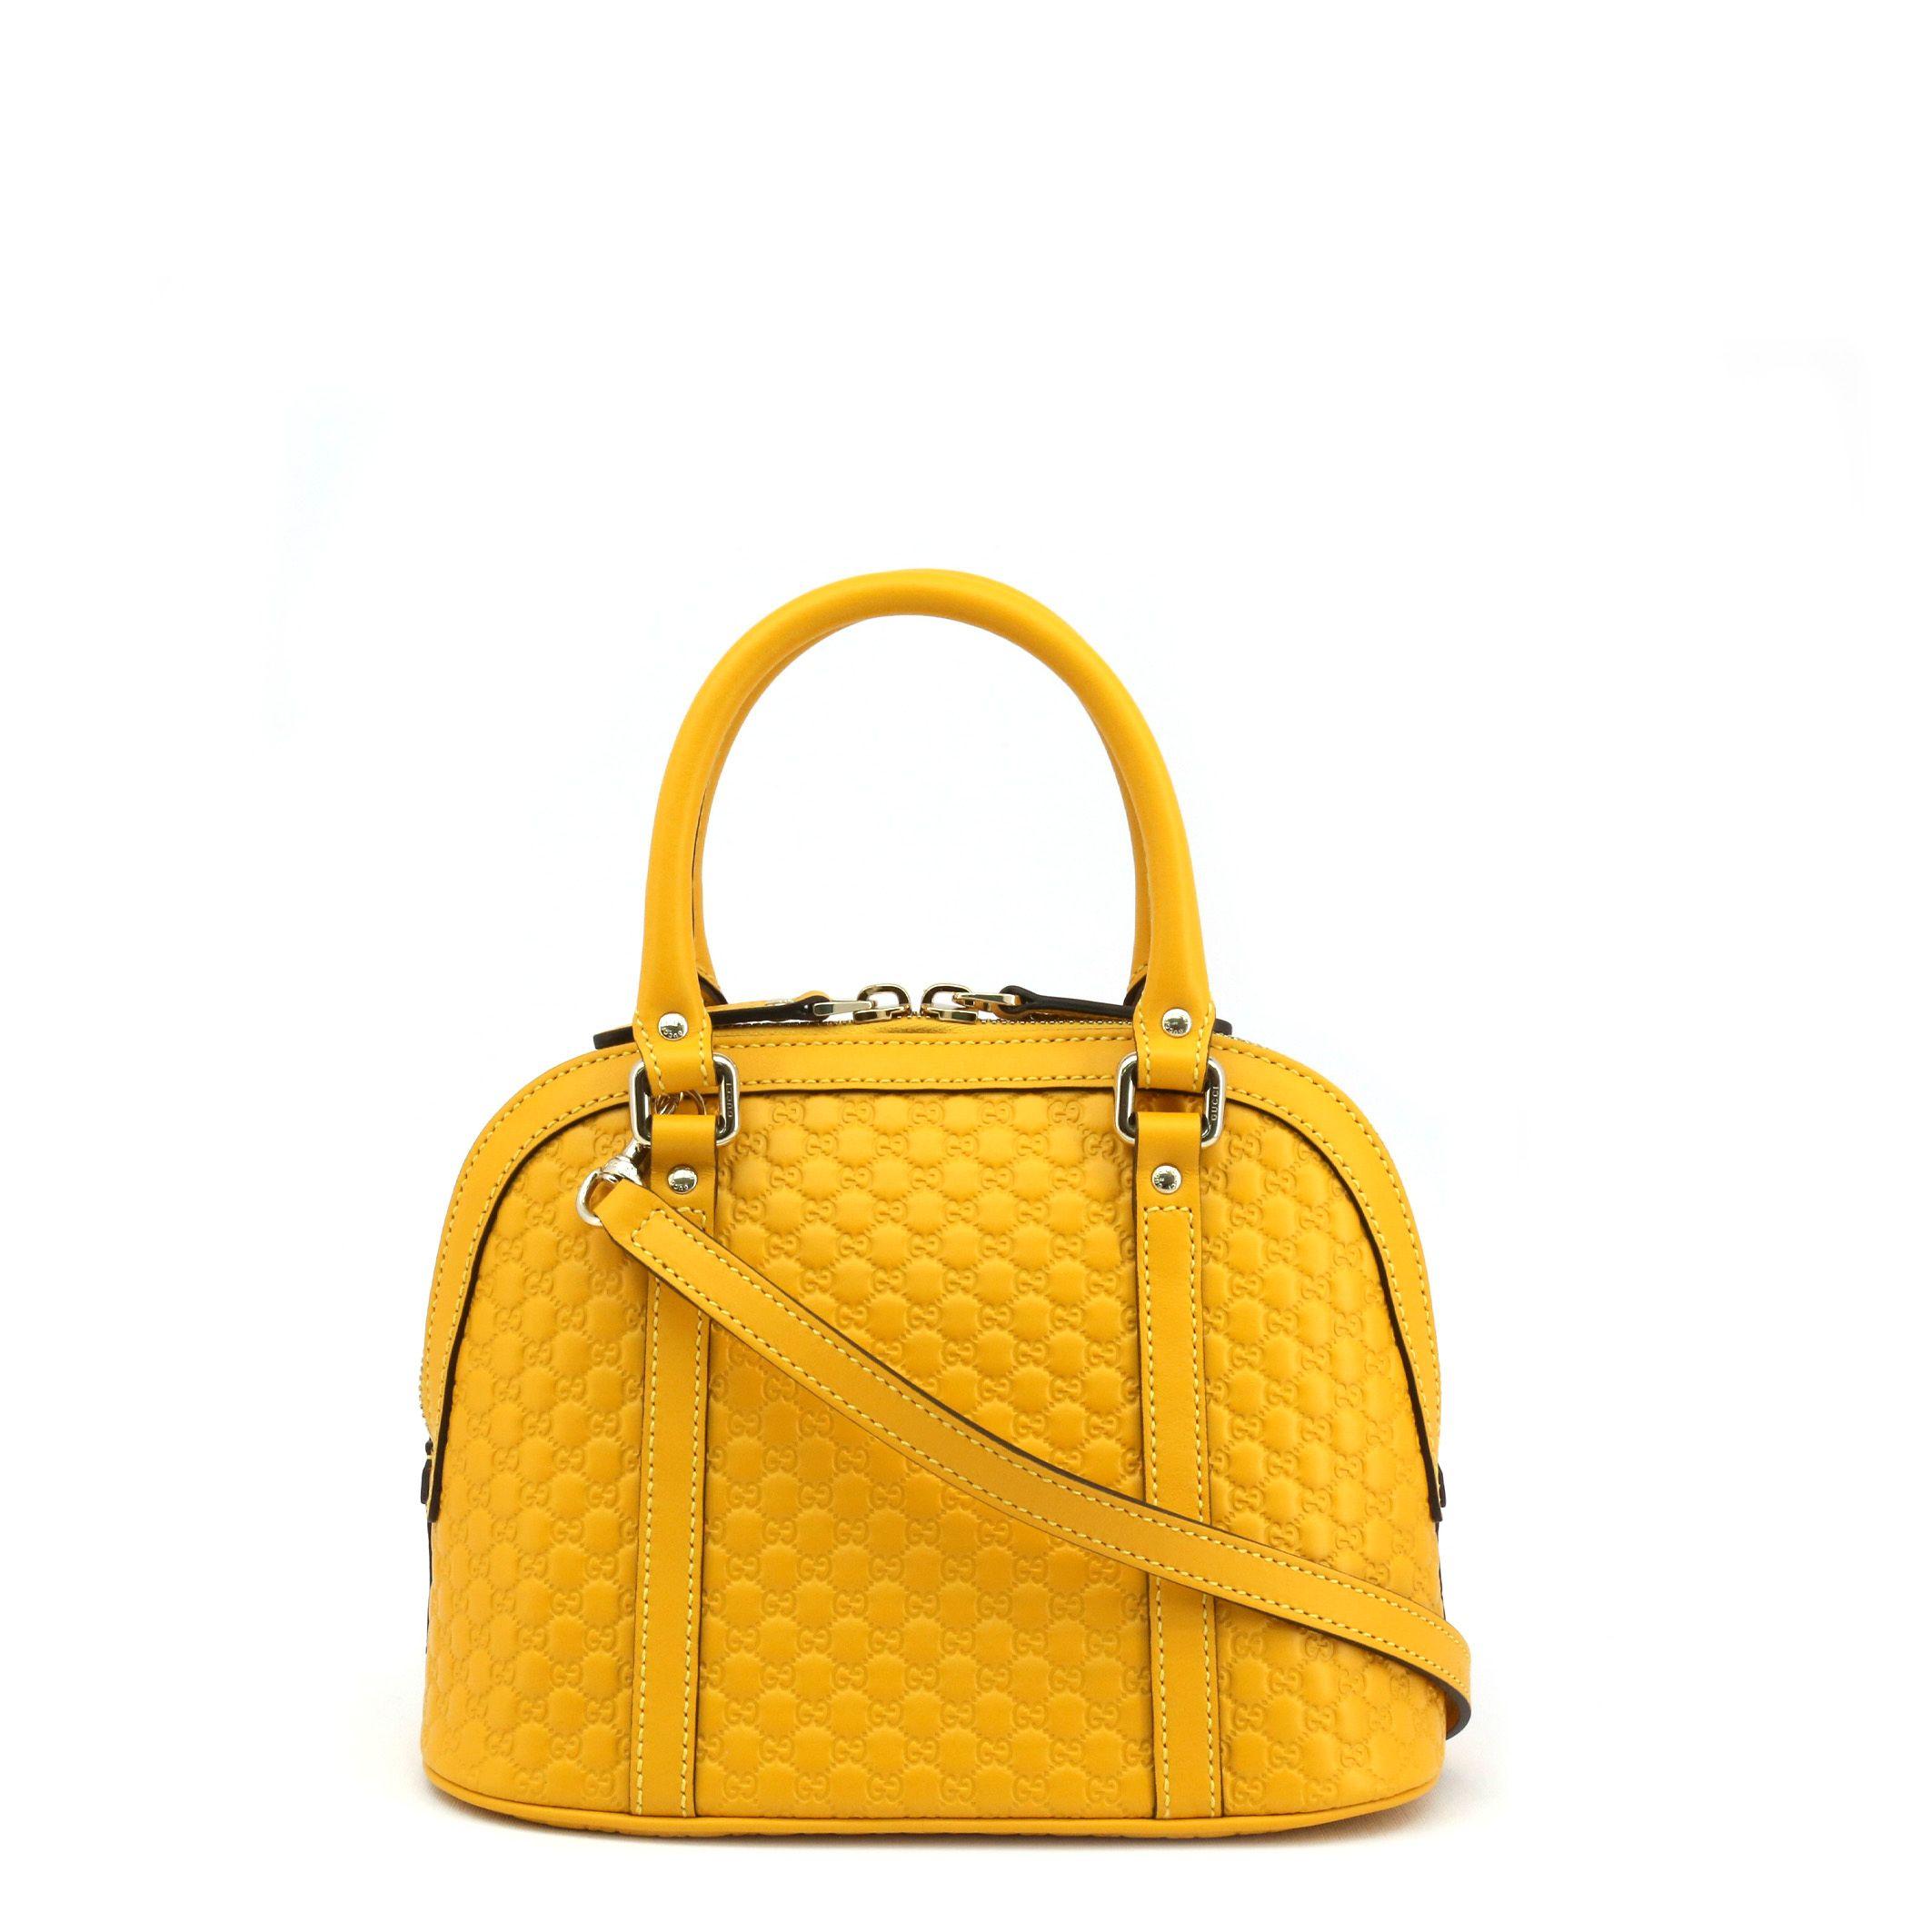 Gucci – 449654_BMJ1G – Geel Designeritems.nl